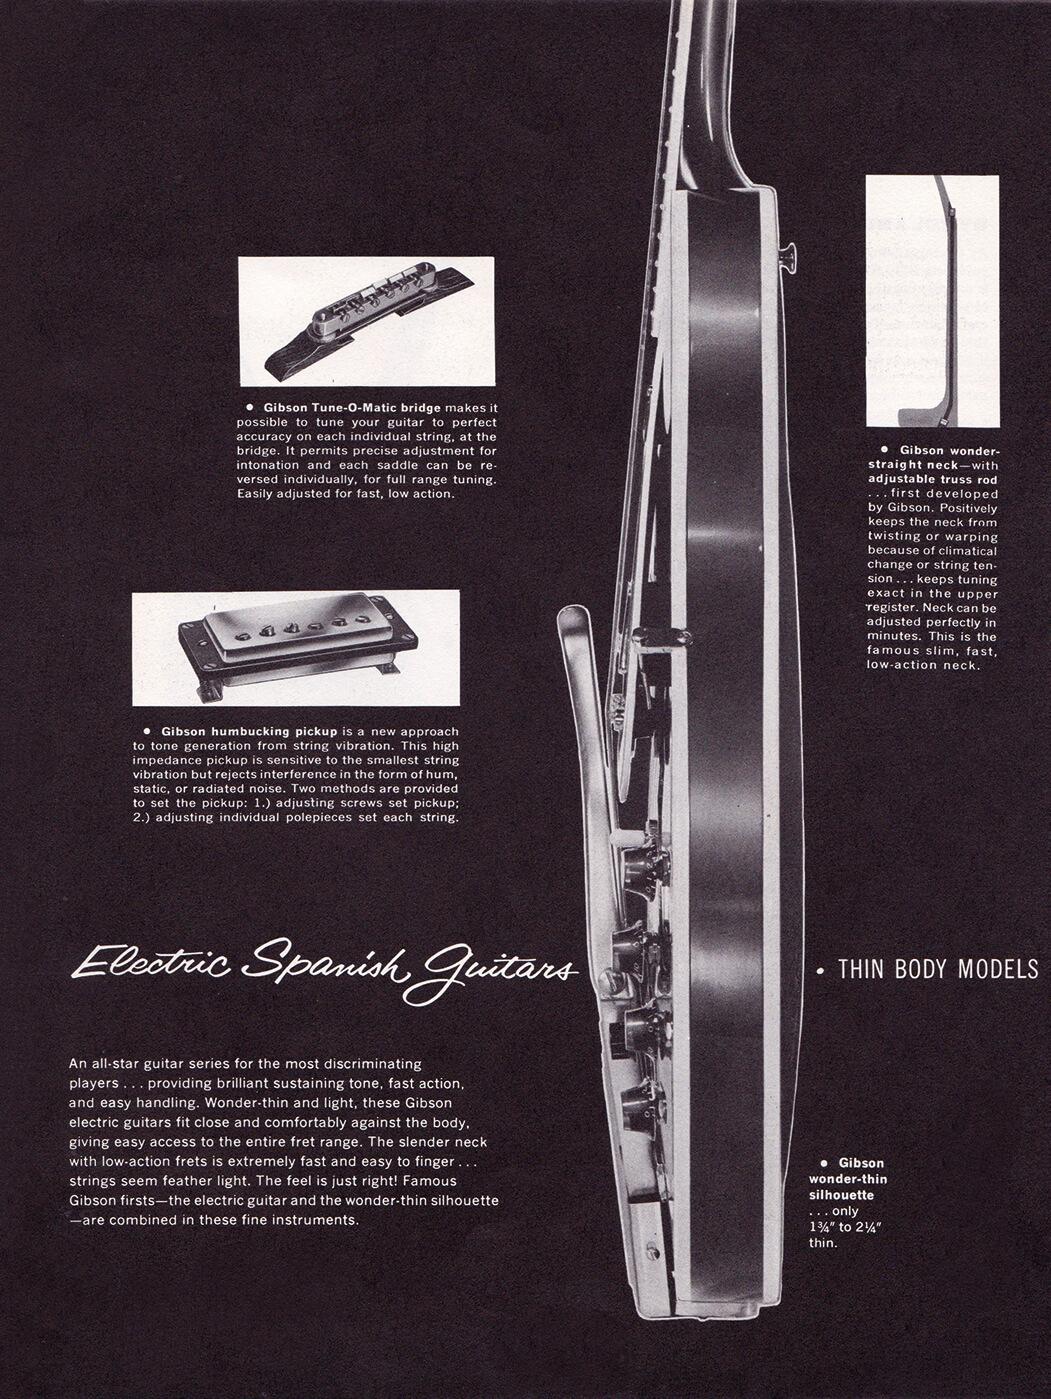 Gibson ES vintage catalogue spanish guitars